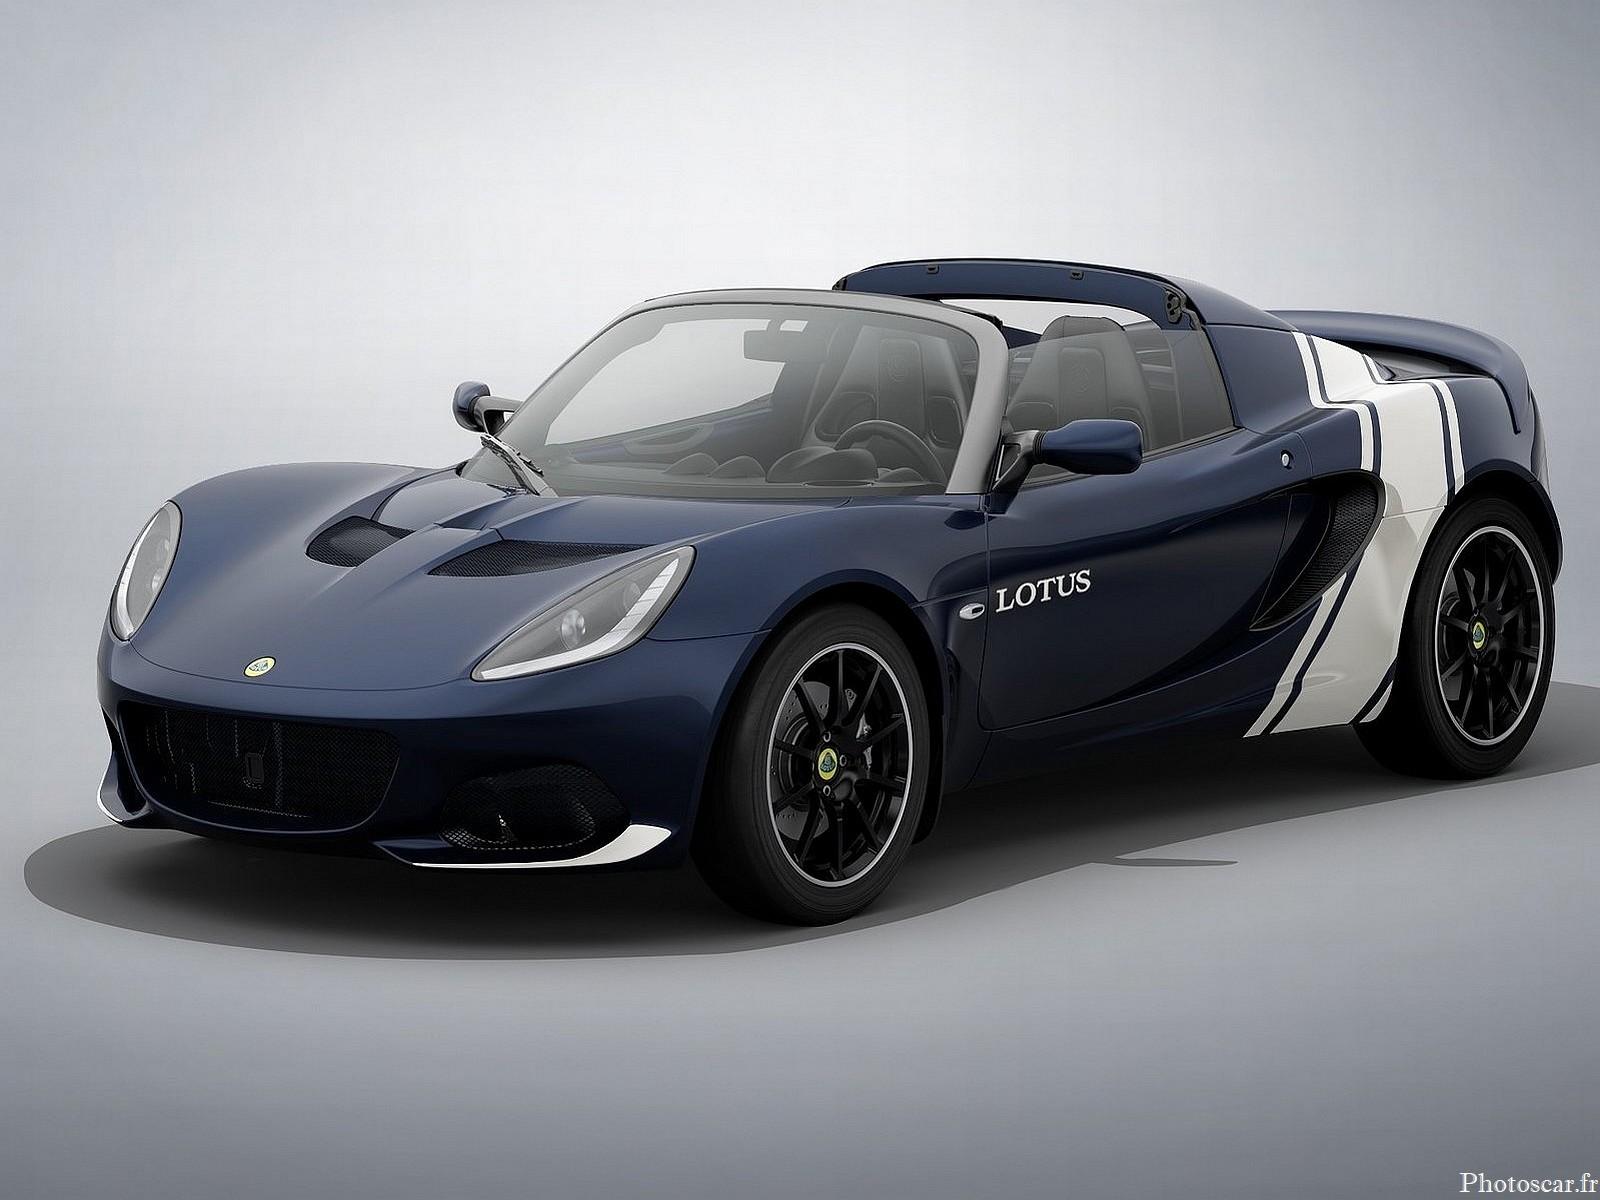 Lotus Elise Classic Heritage Edition 2020